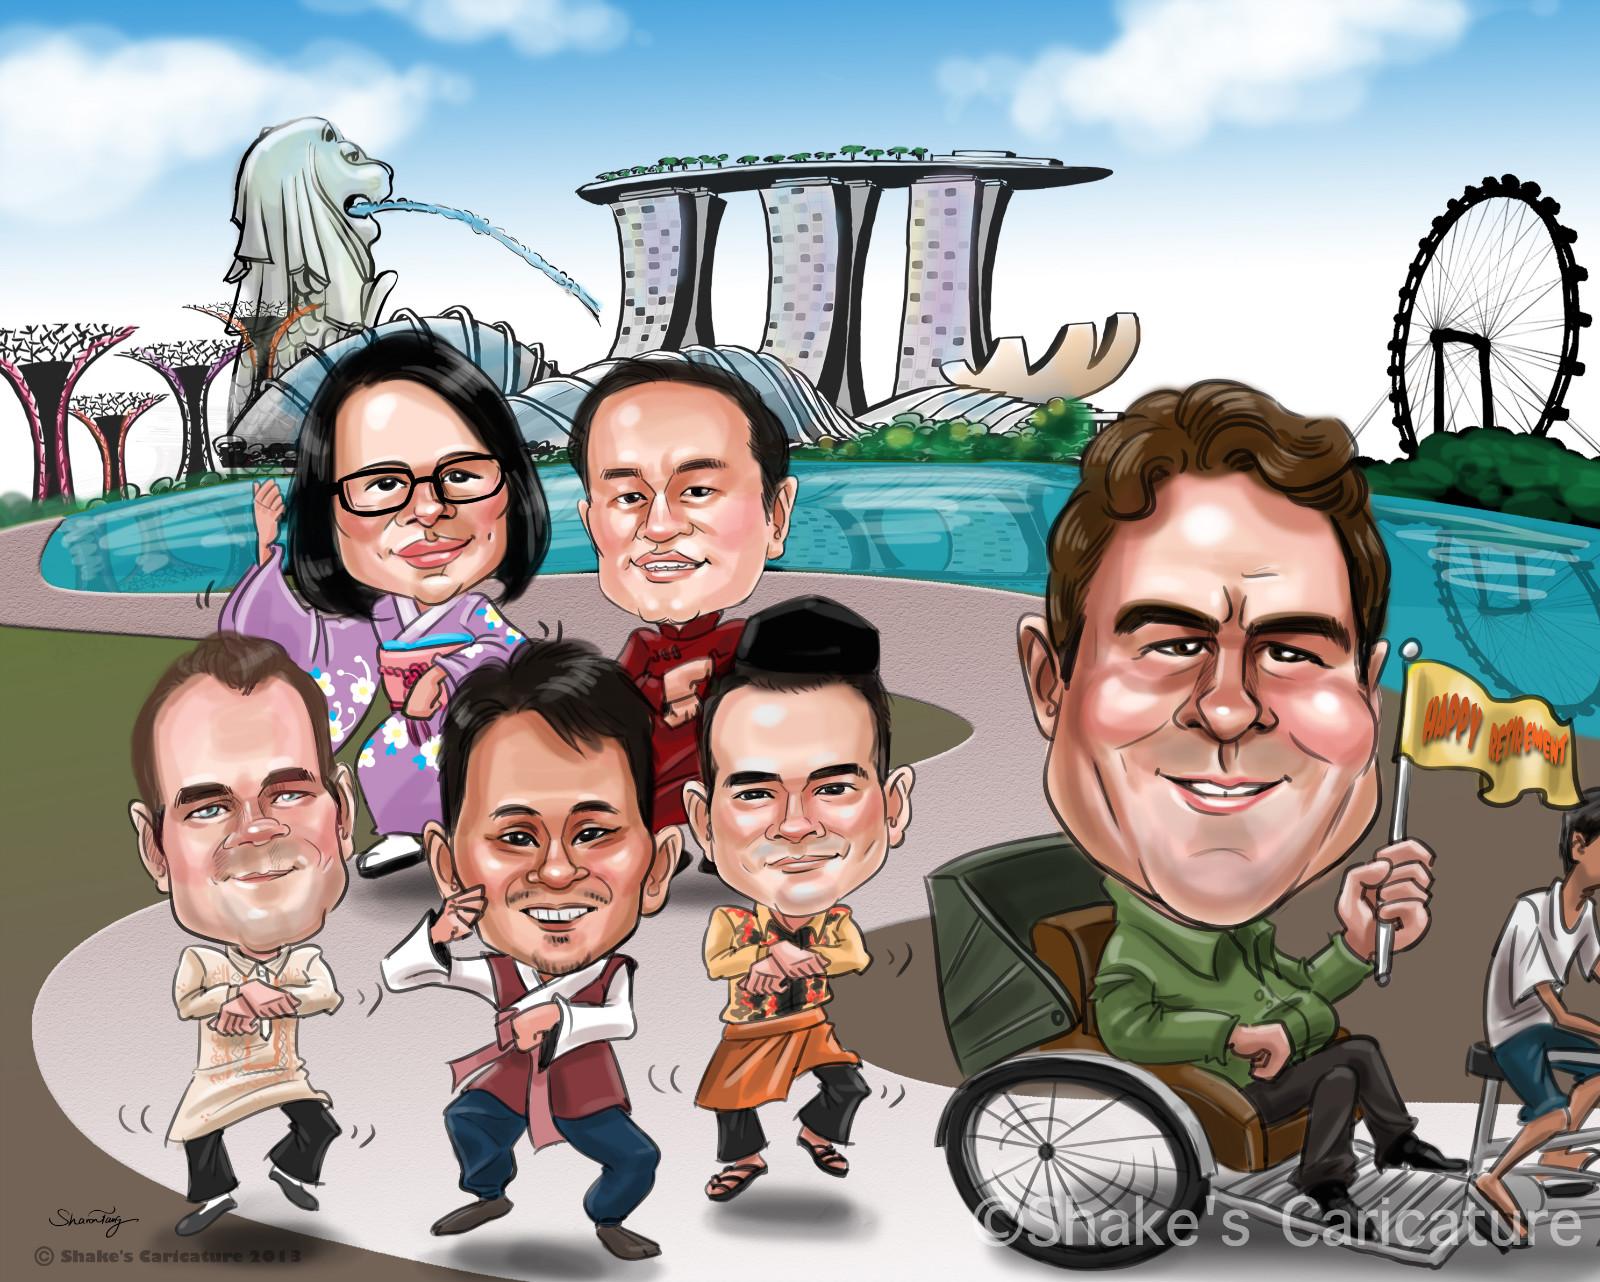 Custom Caricatures Shake's Caricature